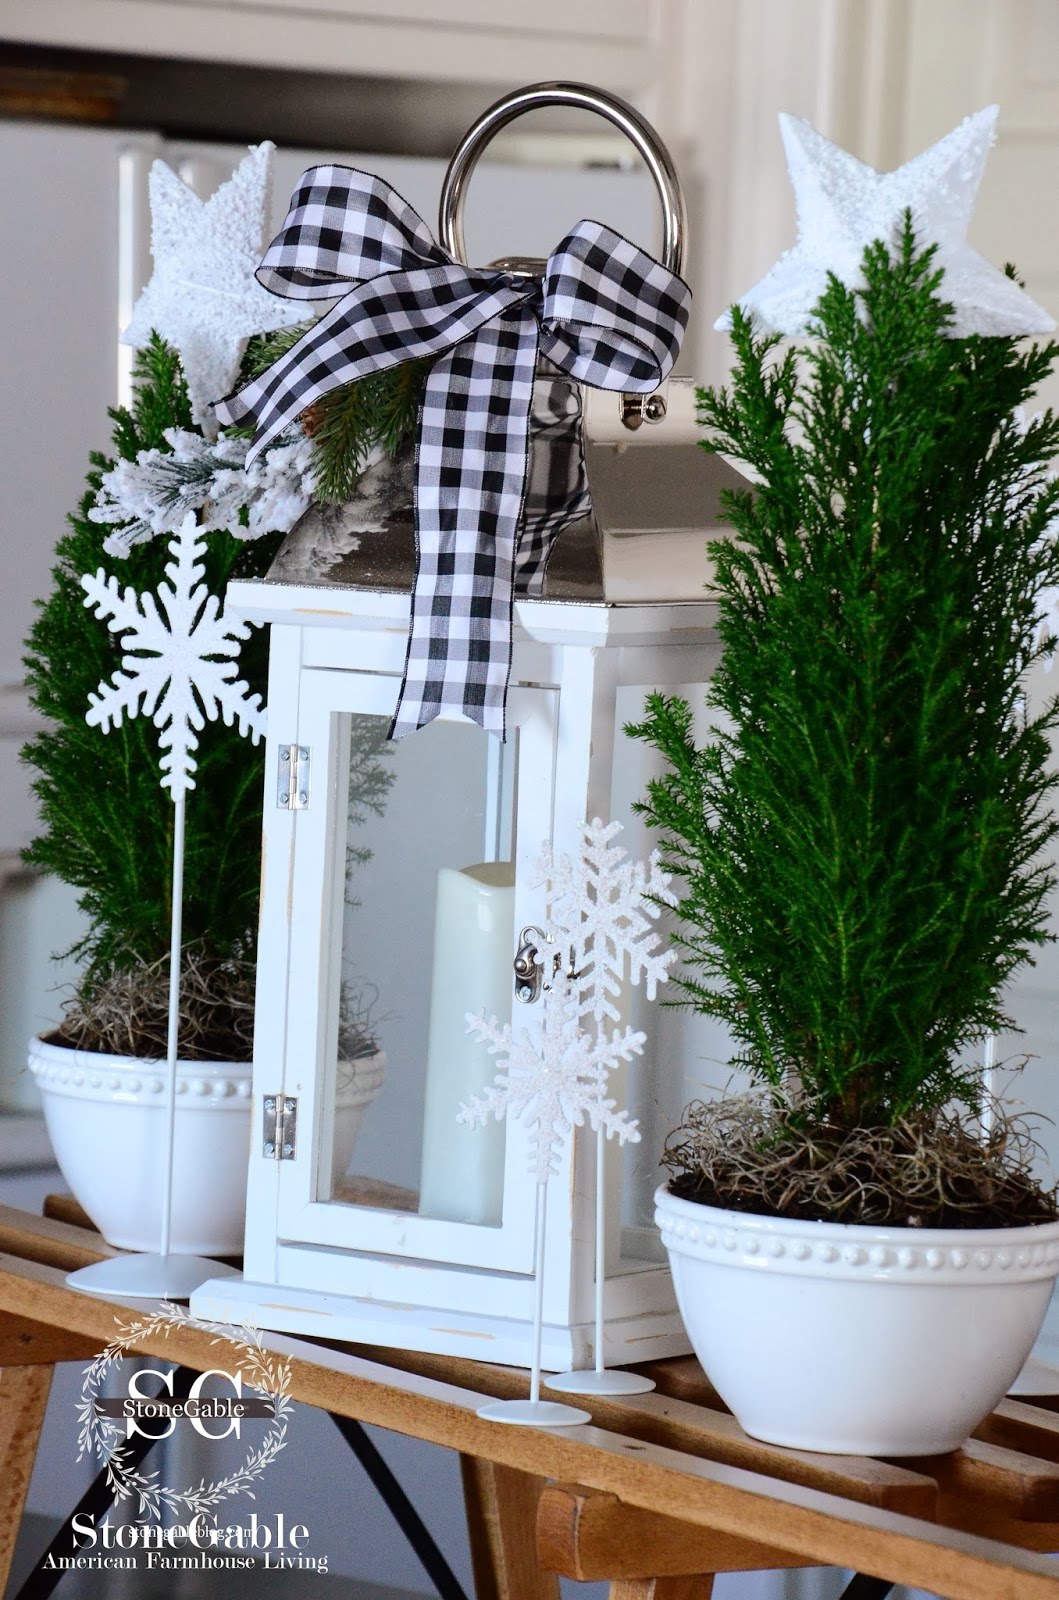 Kitchen Shelf Decor Classics Denver A Farmhouse Christmas - Stonegable